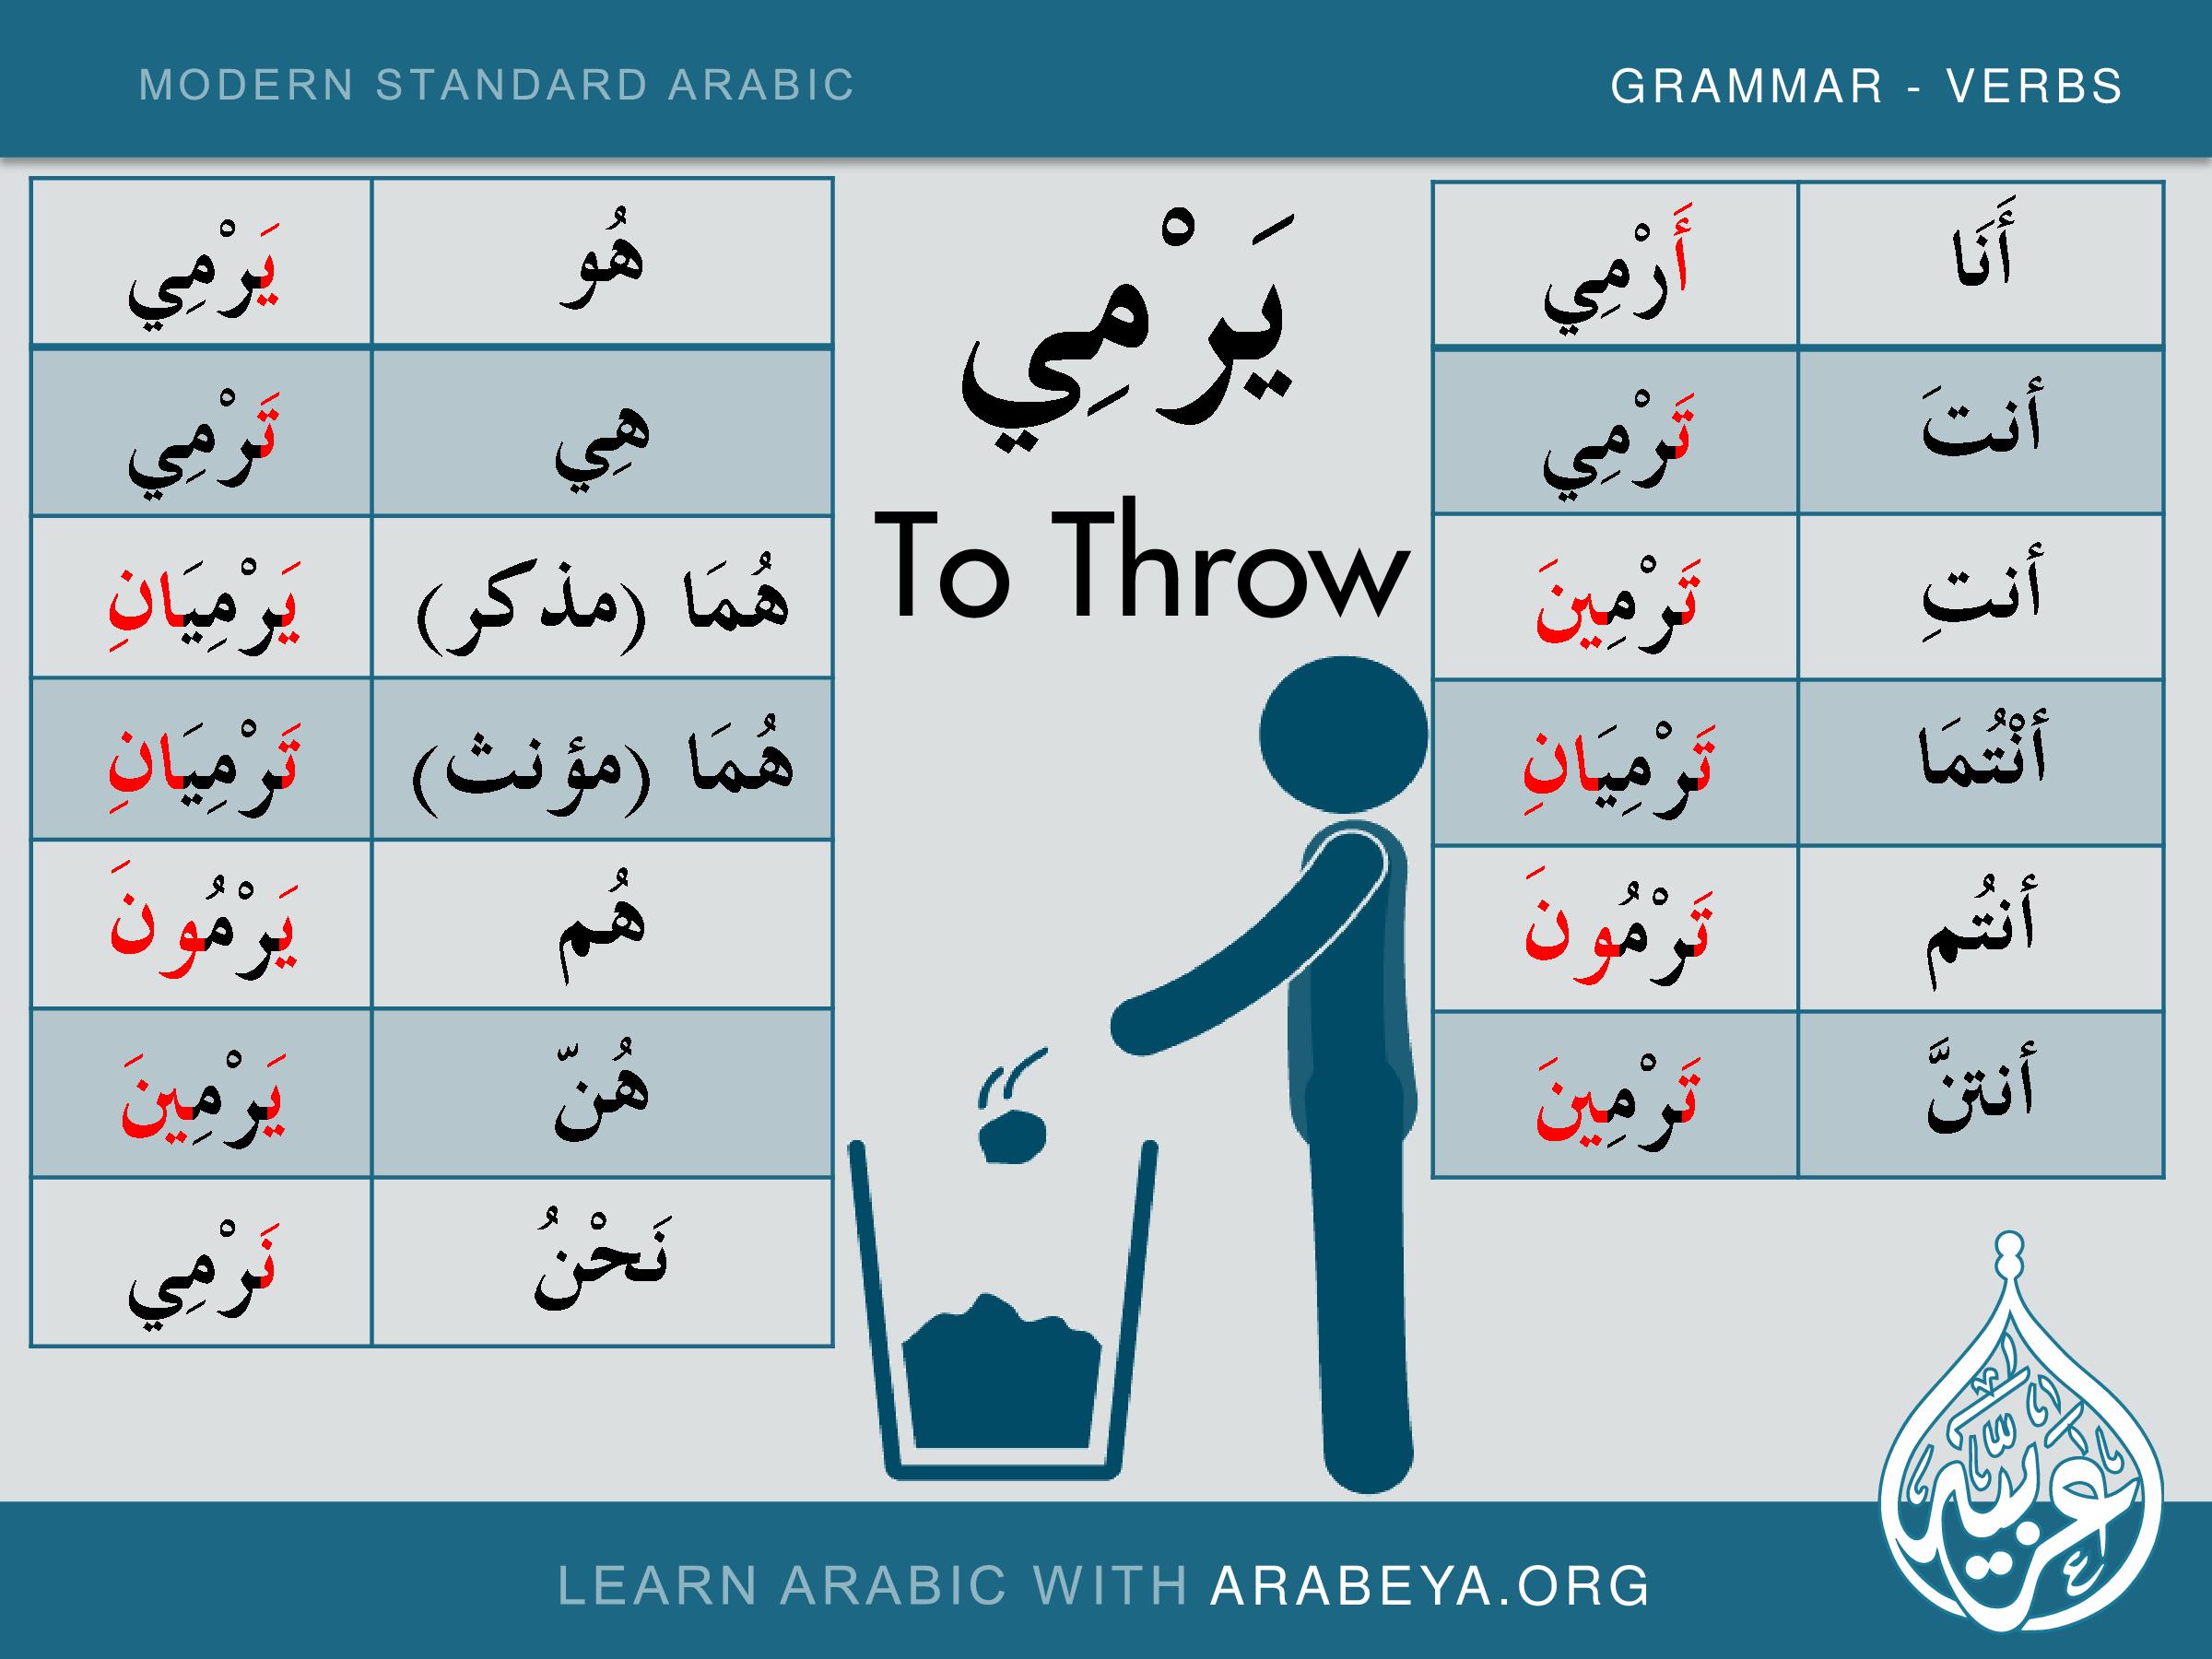 To Throw